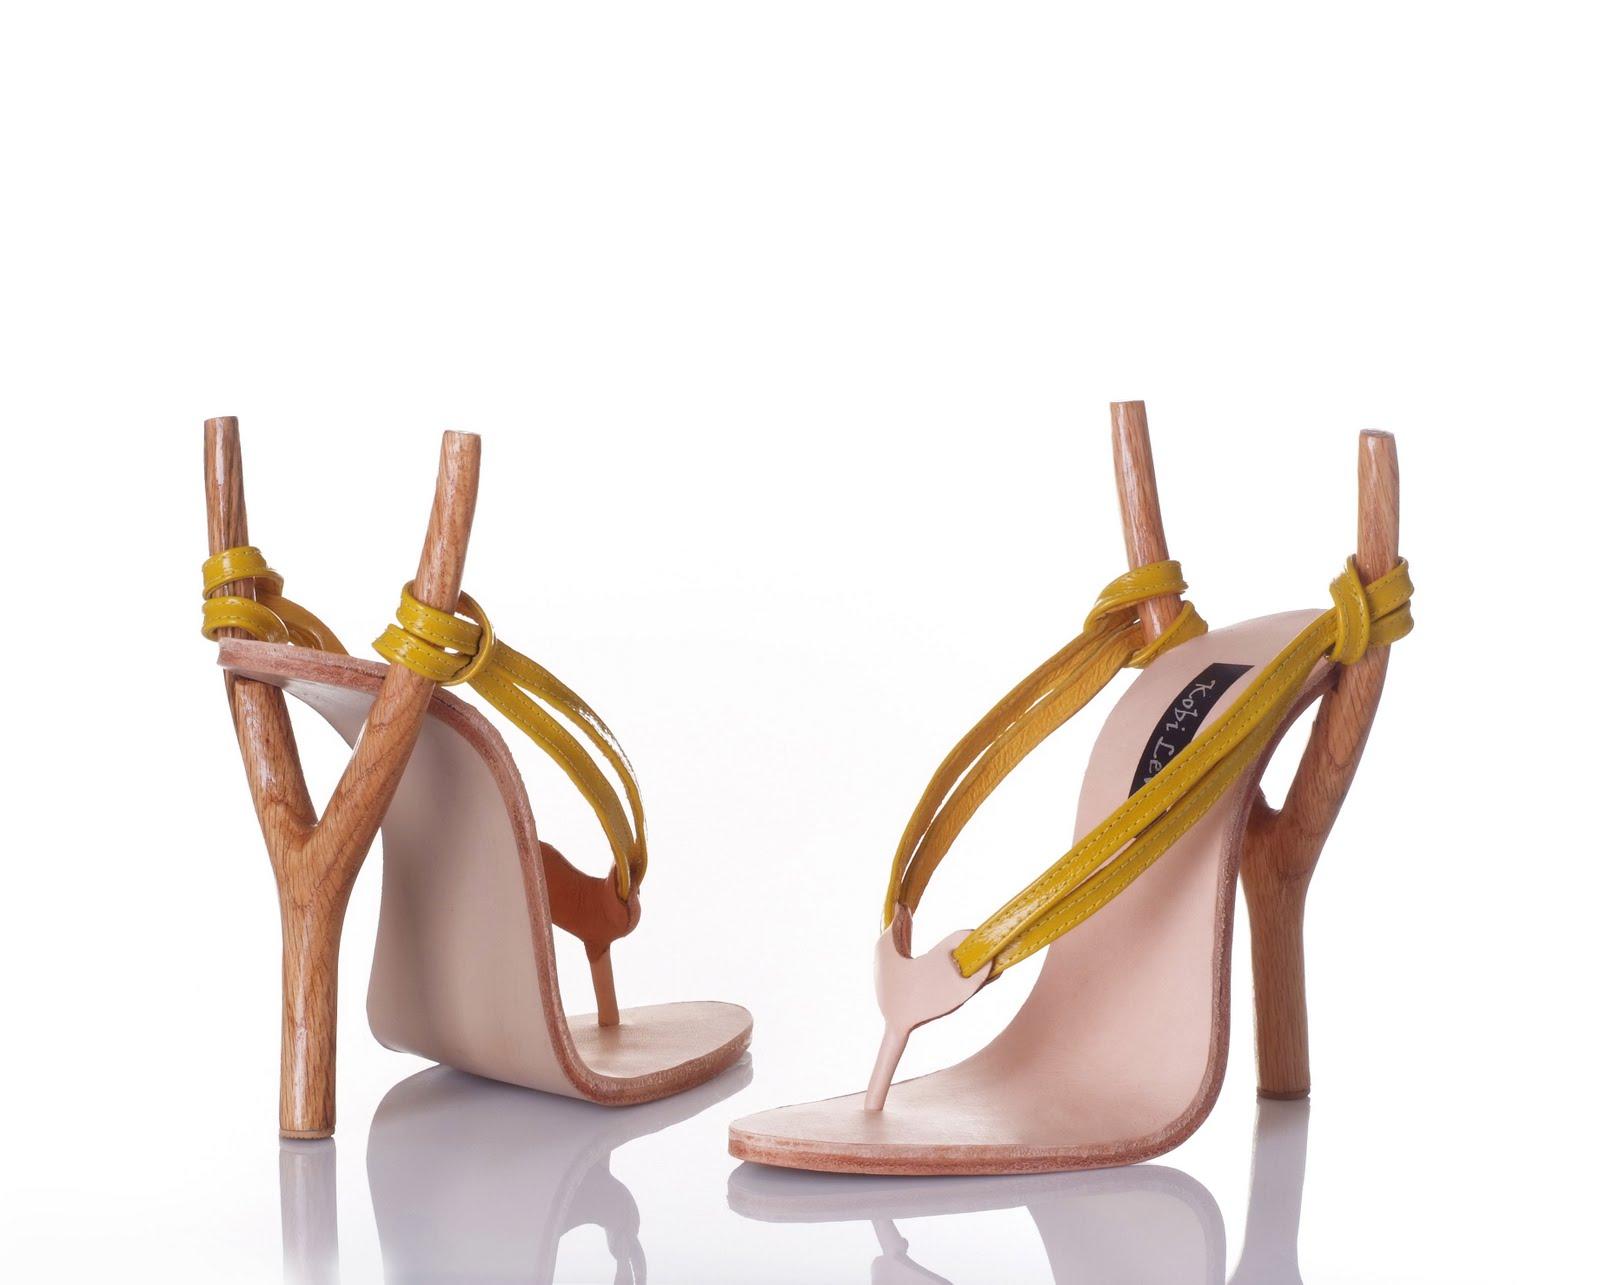 slingshot11 Artistic Footwear Designs by Kobi Levi